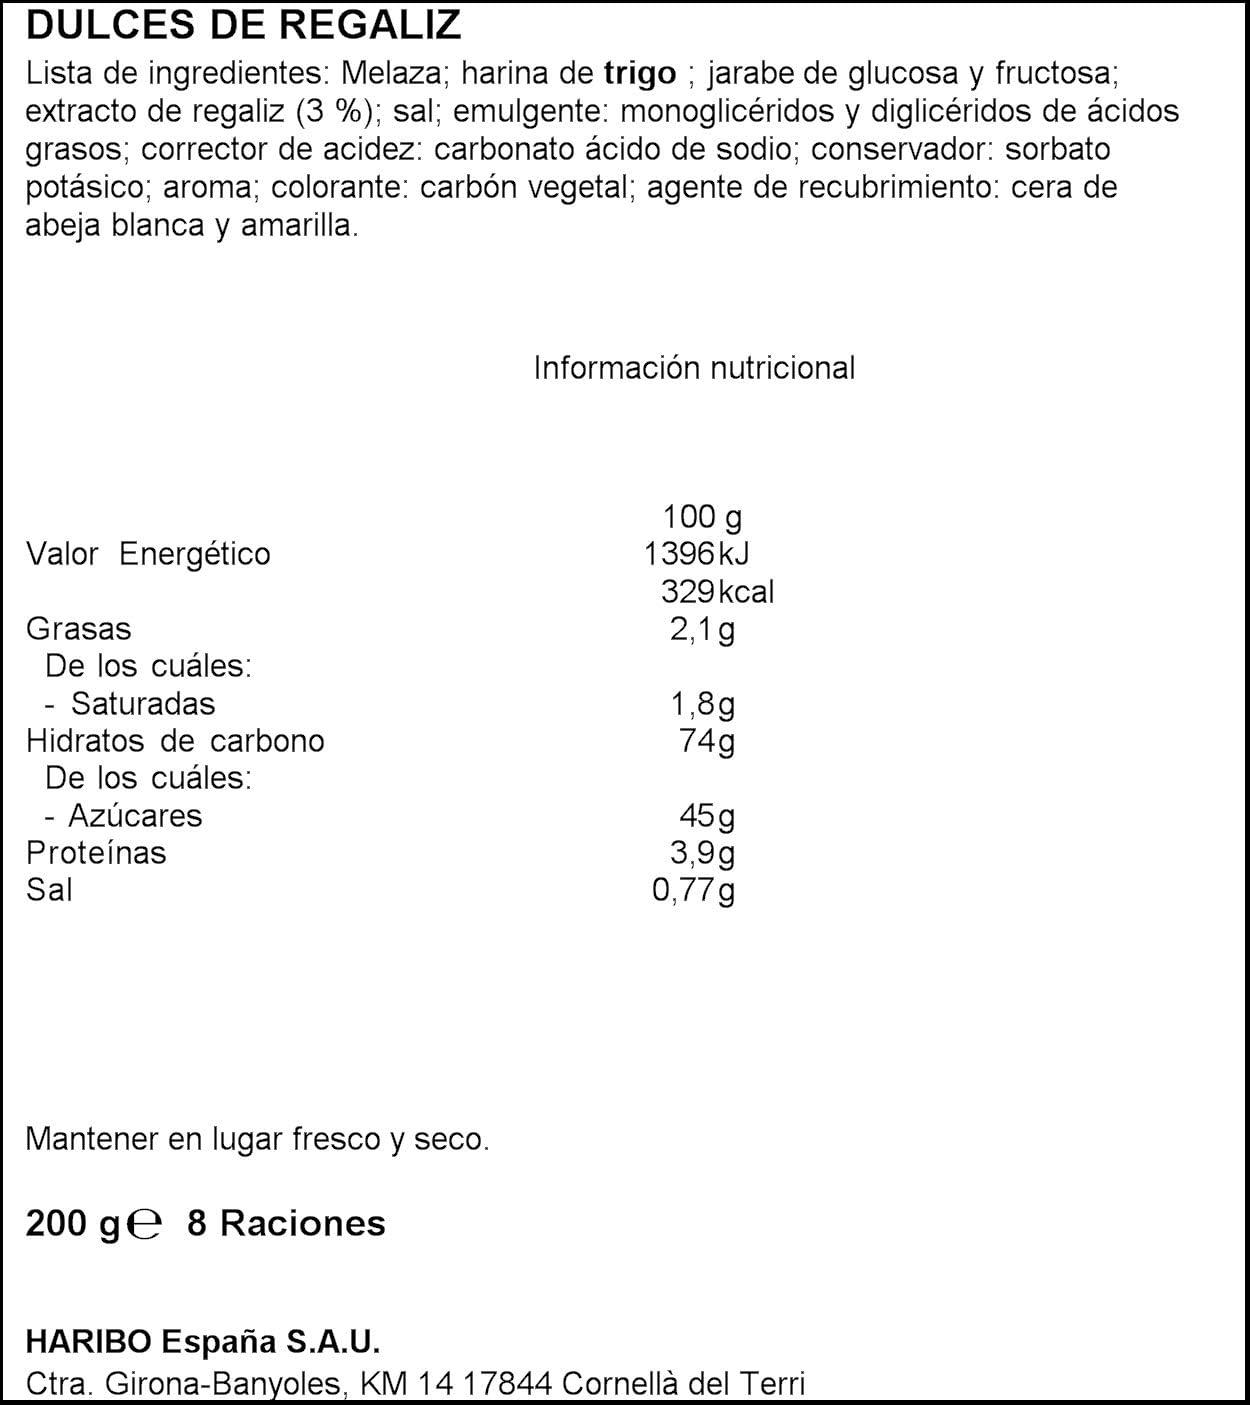 Haribo Mega Torcidas Regaliz Dulces de Regaliz - 200 gr